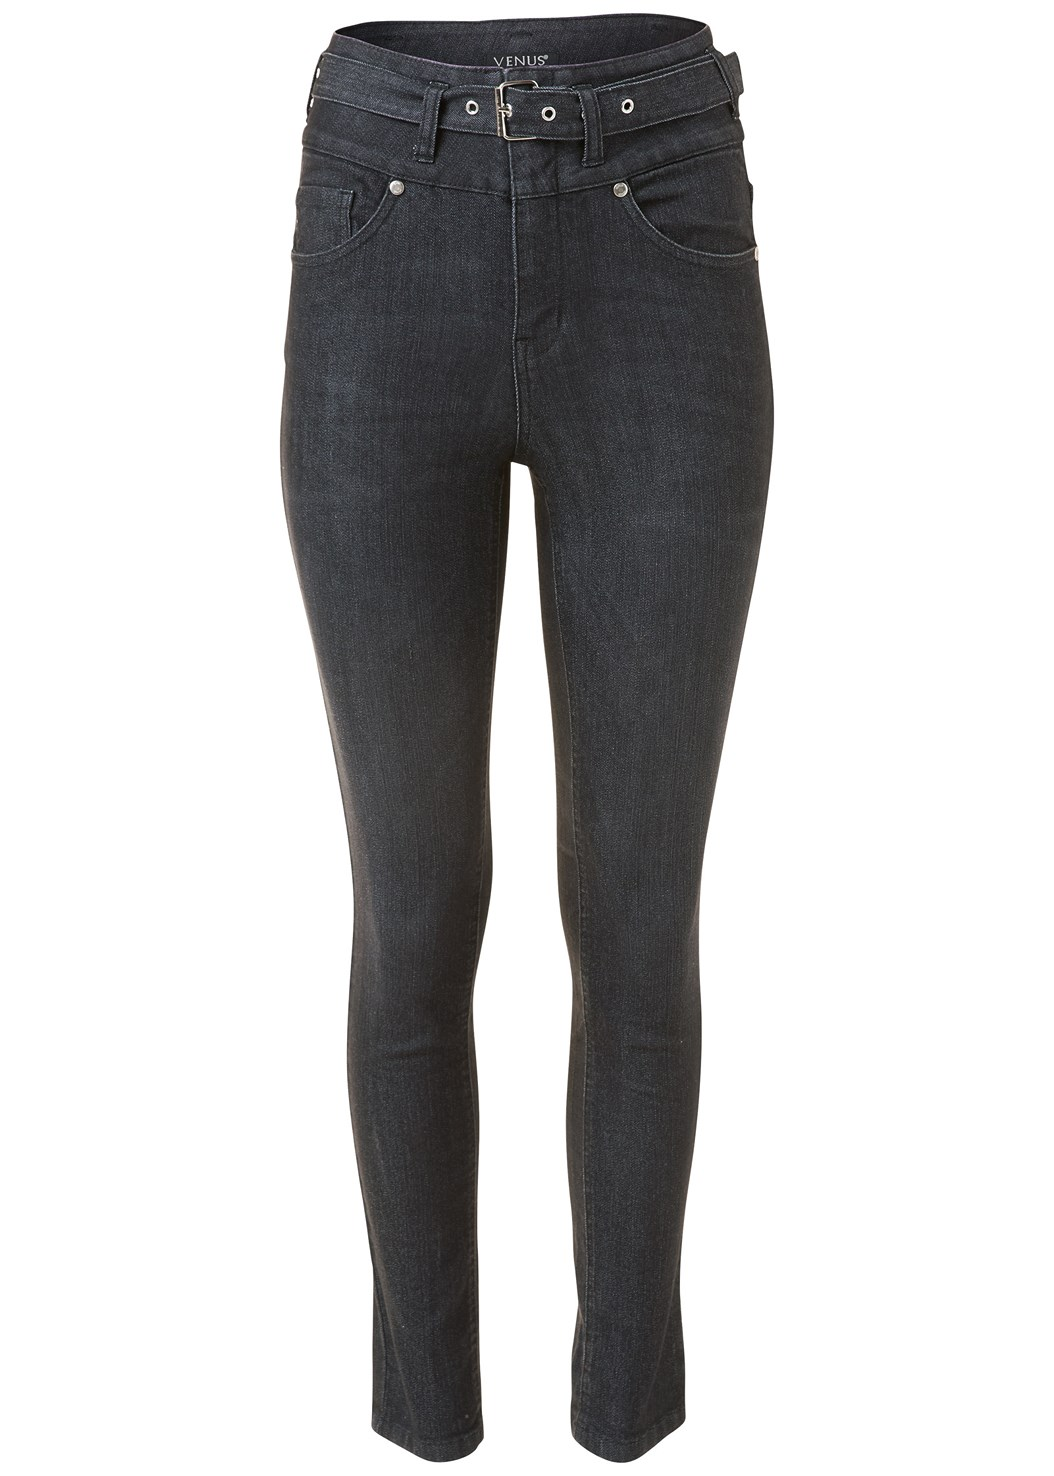 Belted High Waist Jeans,Buckle Detail Top,One Shoulder Bodysuit